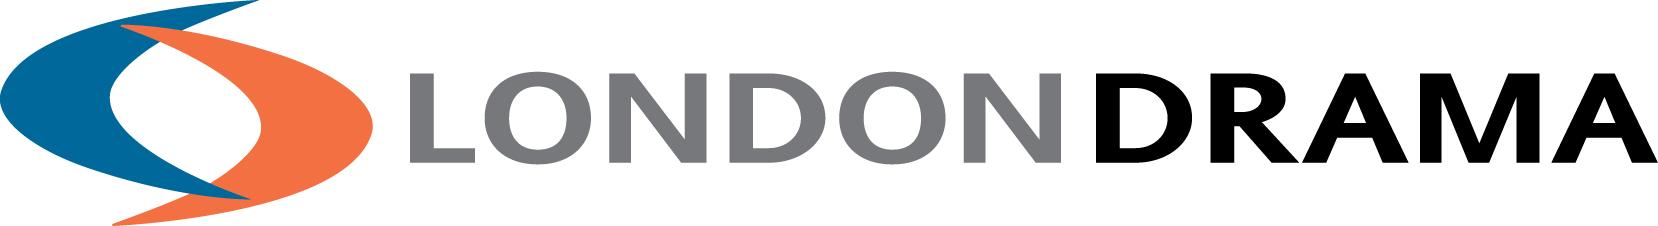 London Drama Logo